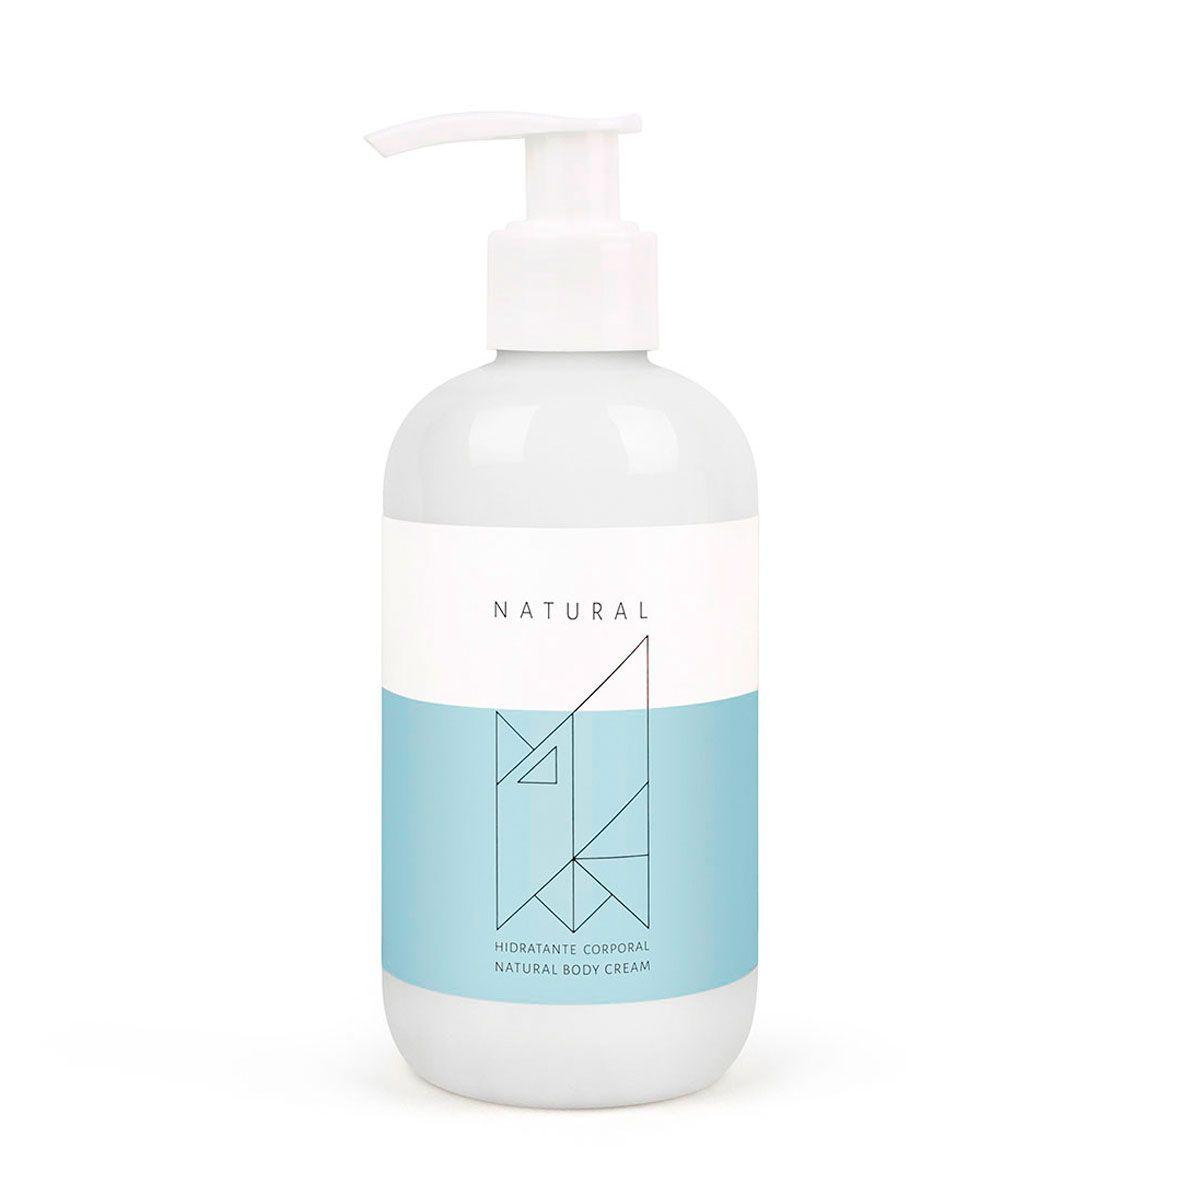 27 90 La Natural Body Cream De Per Purr Es Una Crema Corporal De